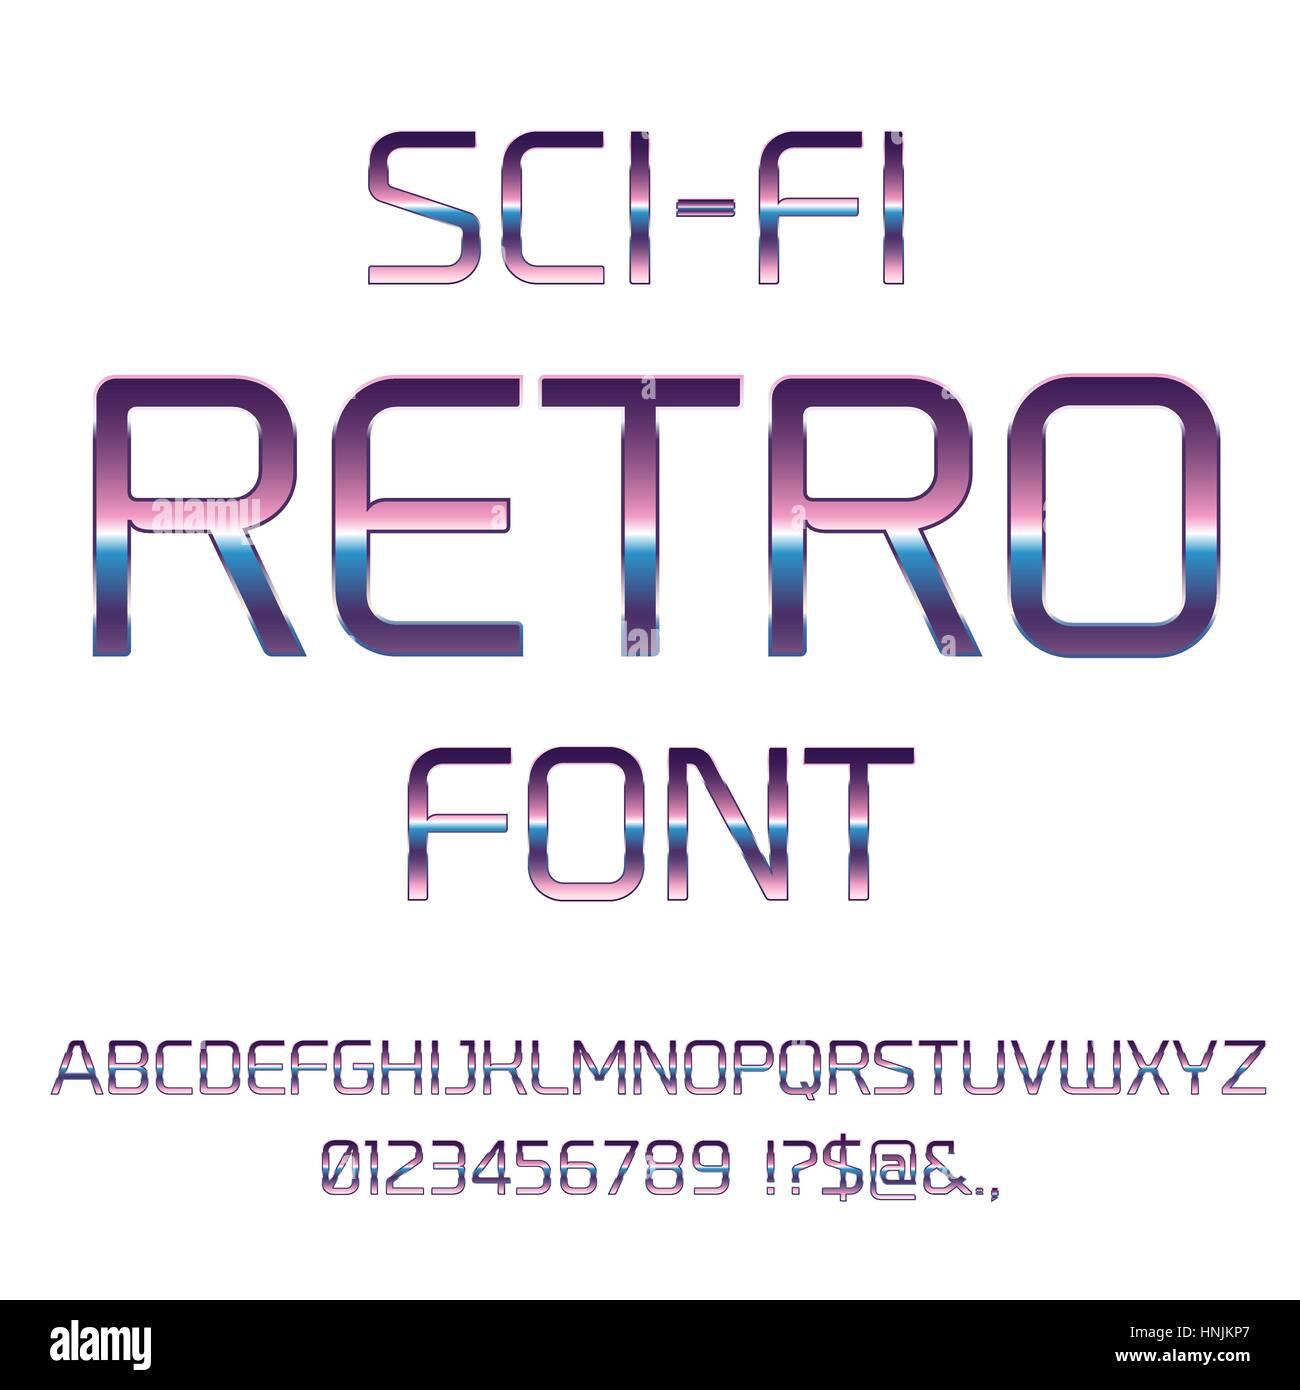 Sci-Fi retro font - Stock Image